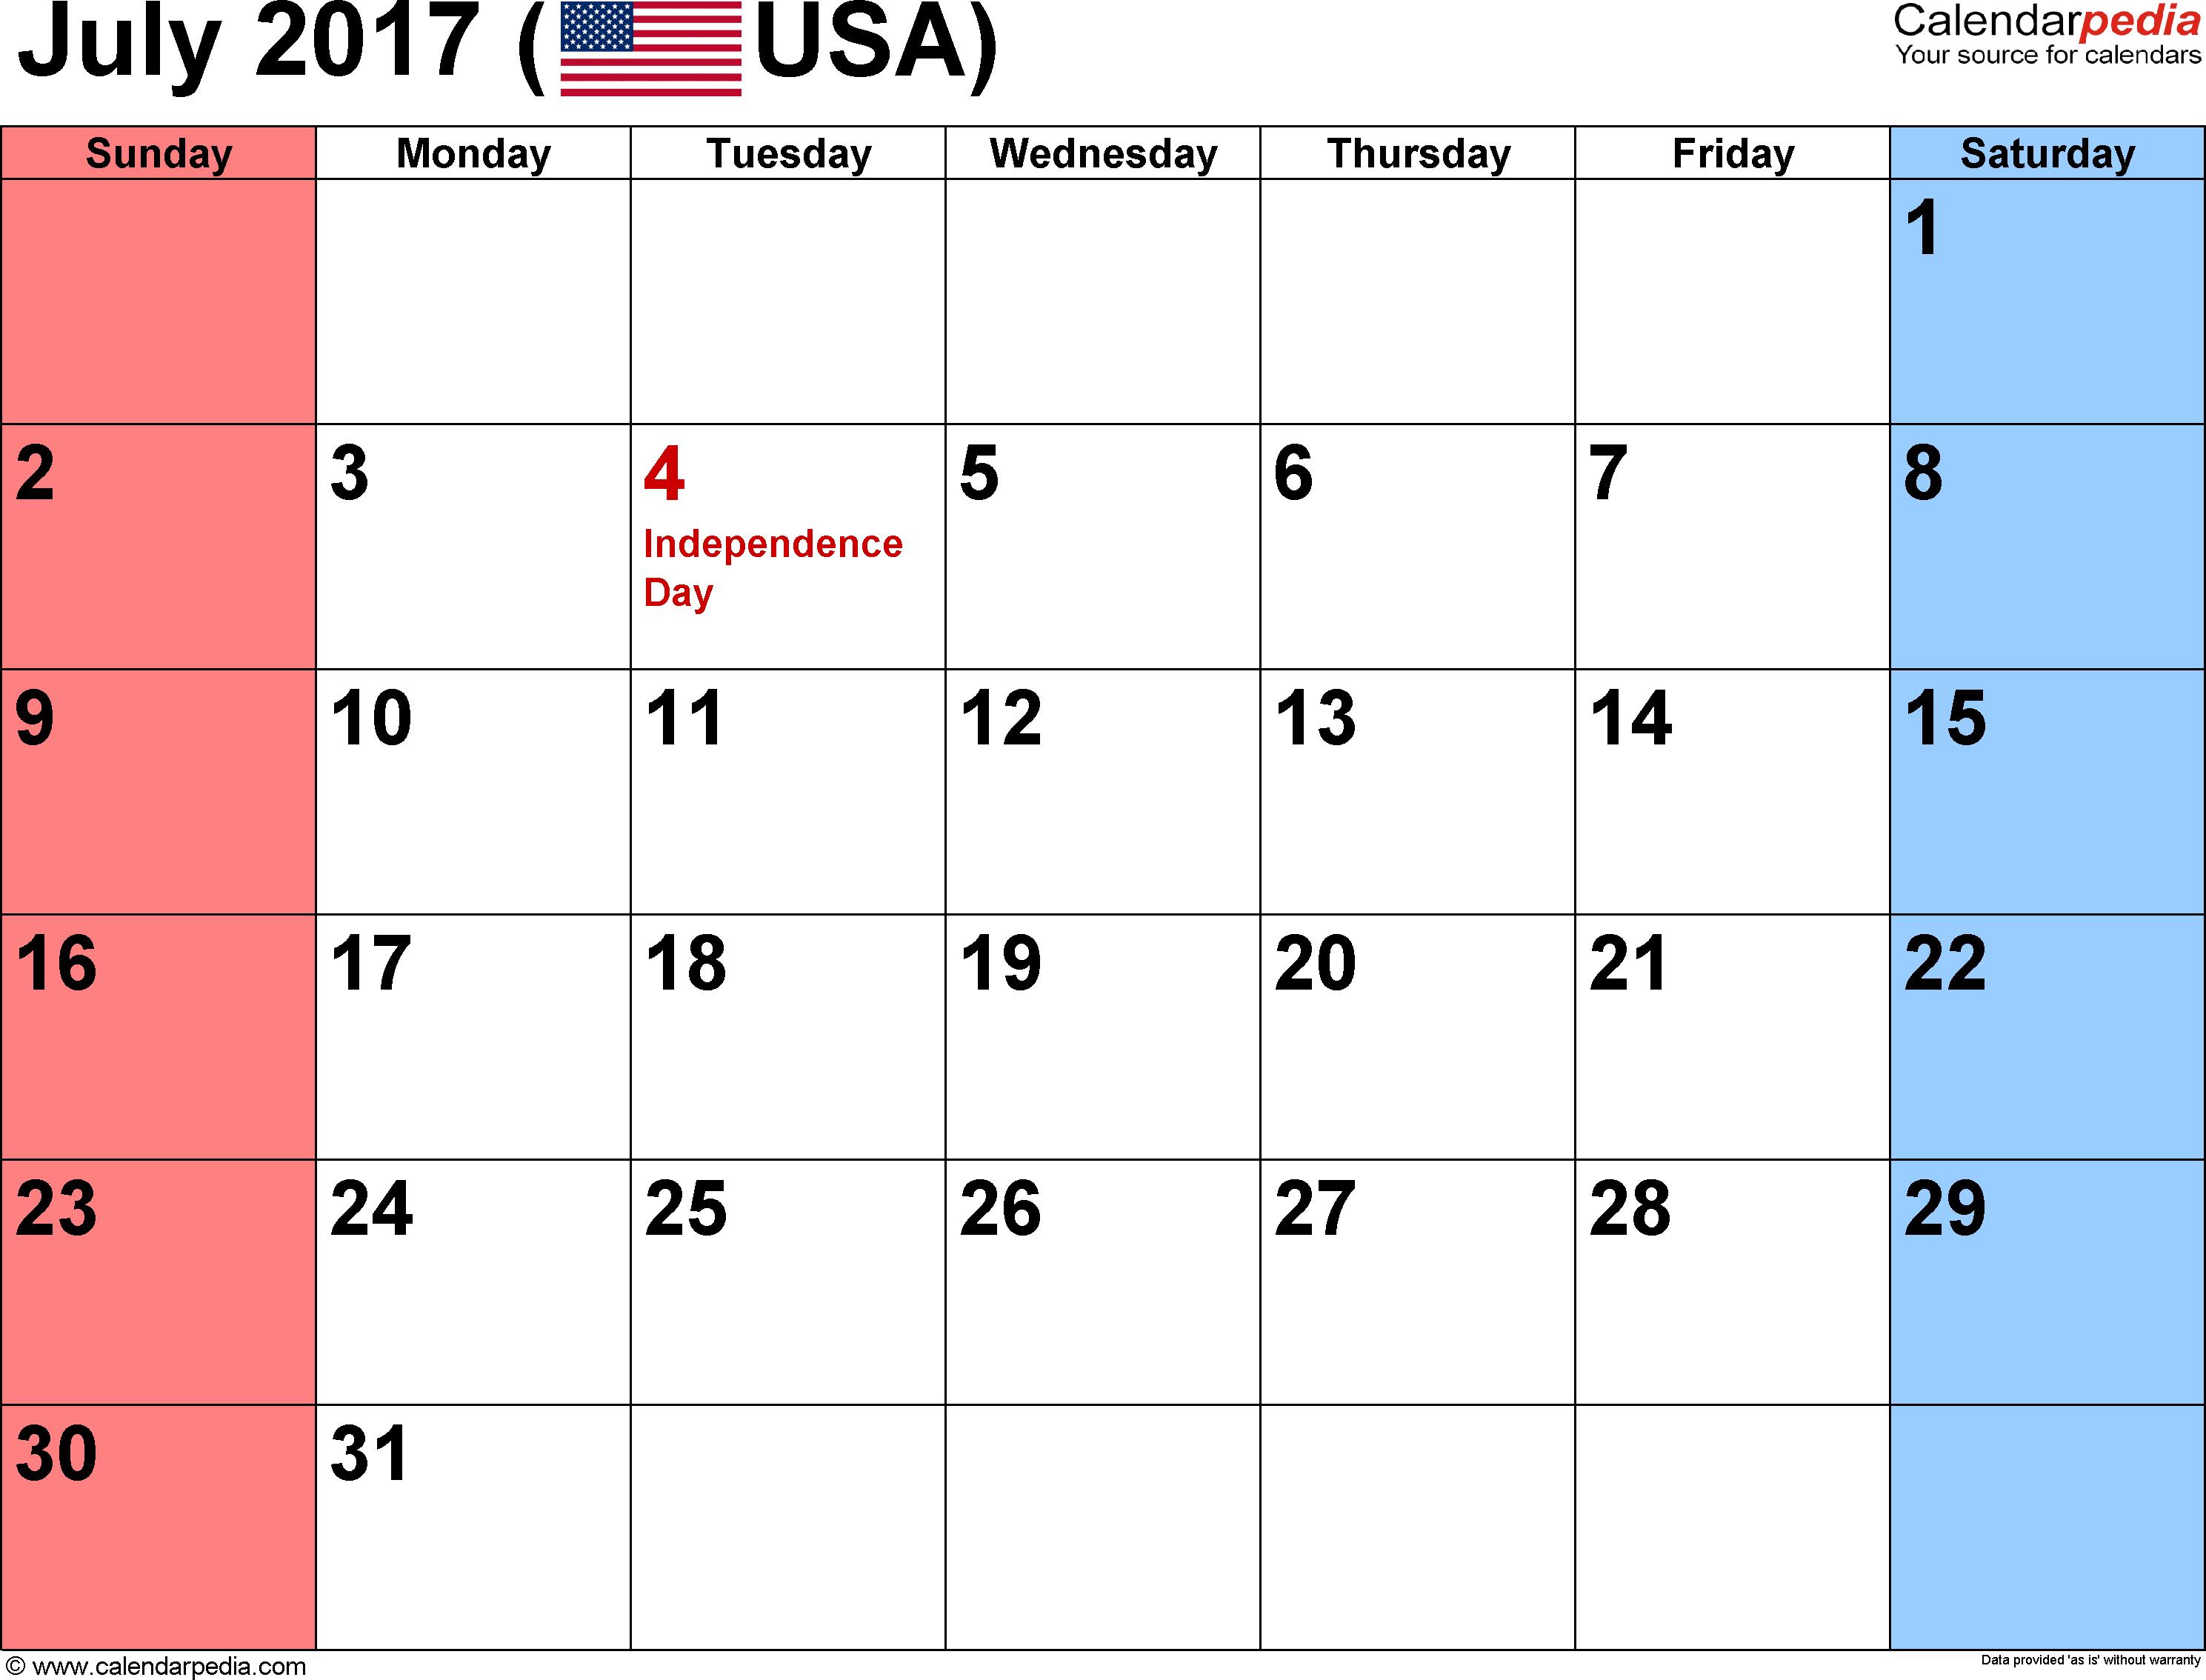 july 2017 calendar usa